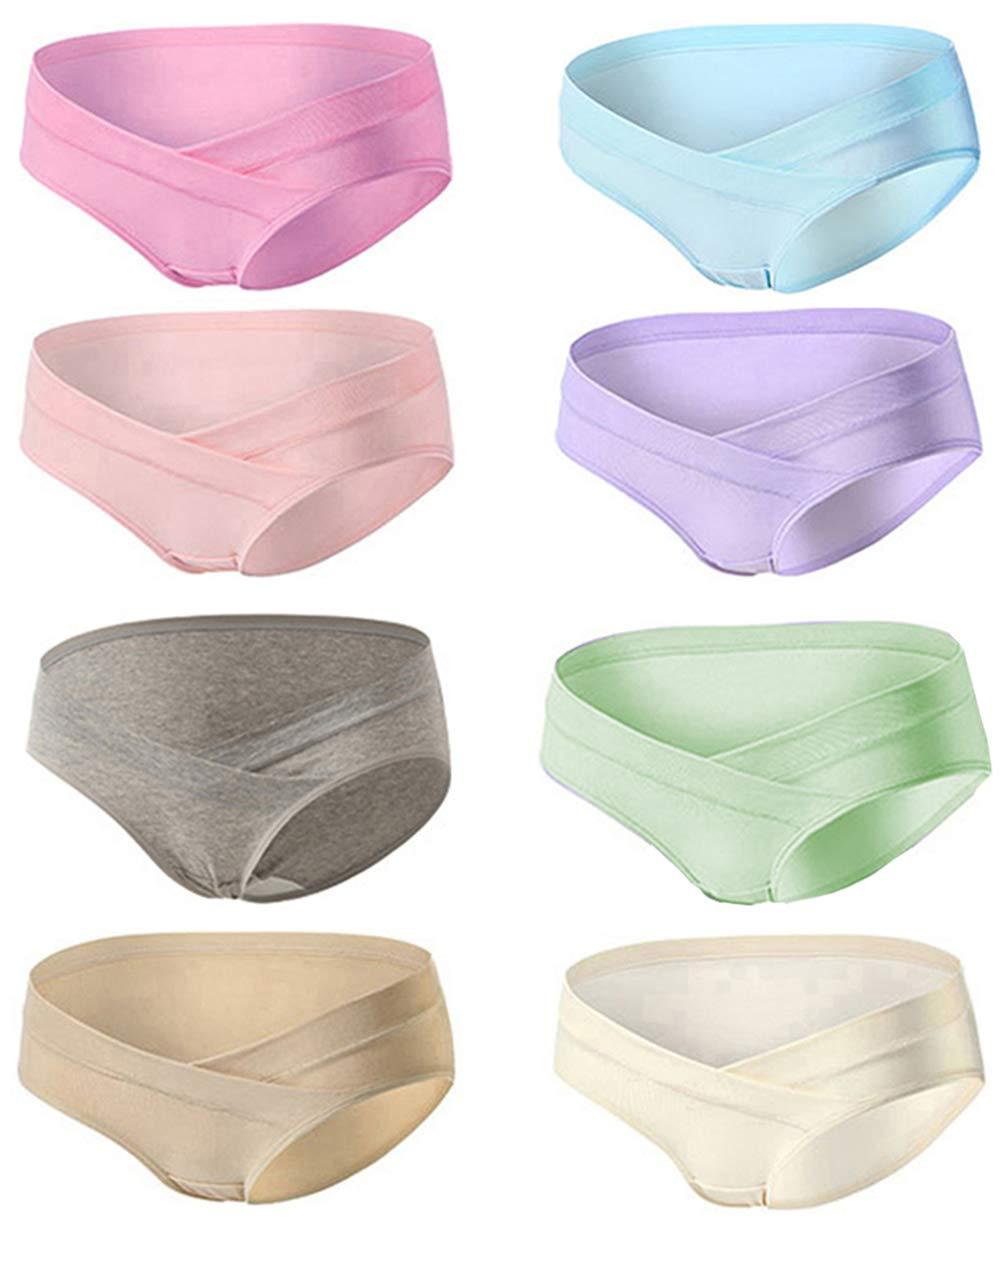 Mommy Jennie Women Under Bump Cotton Maternity-Underwear Multi Pack Healthy Maternity Pregnancy Panties